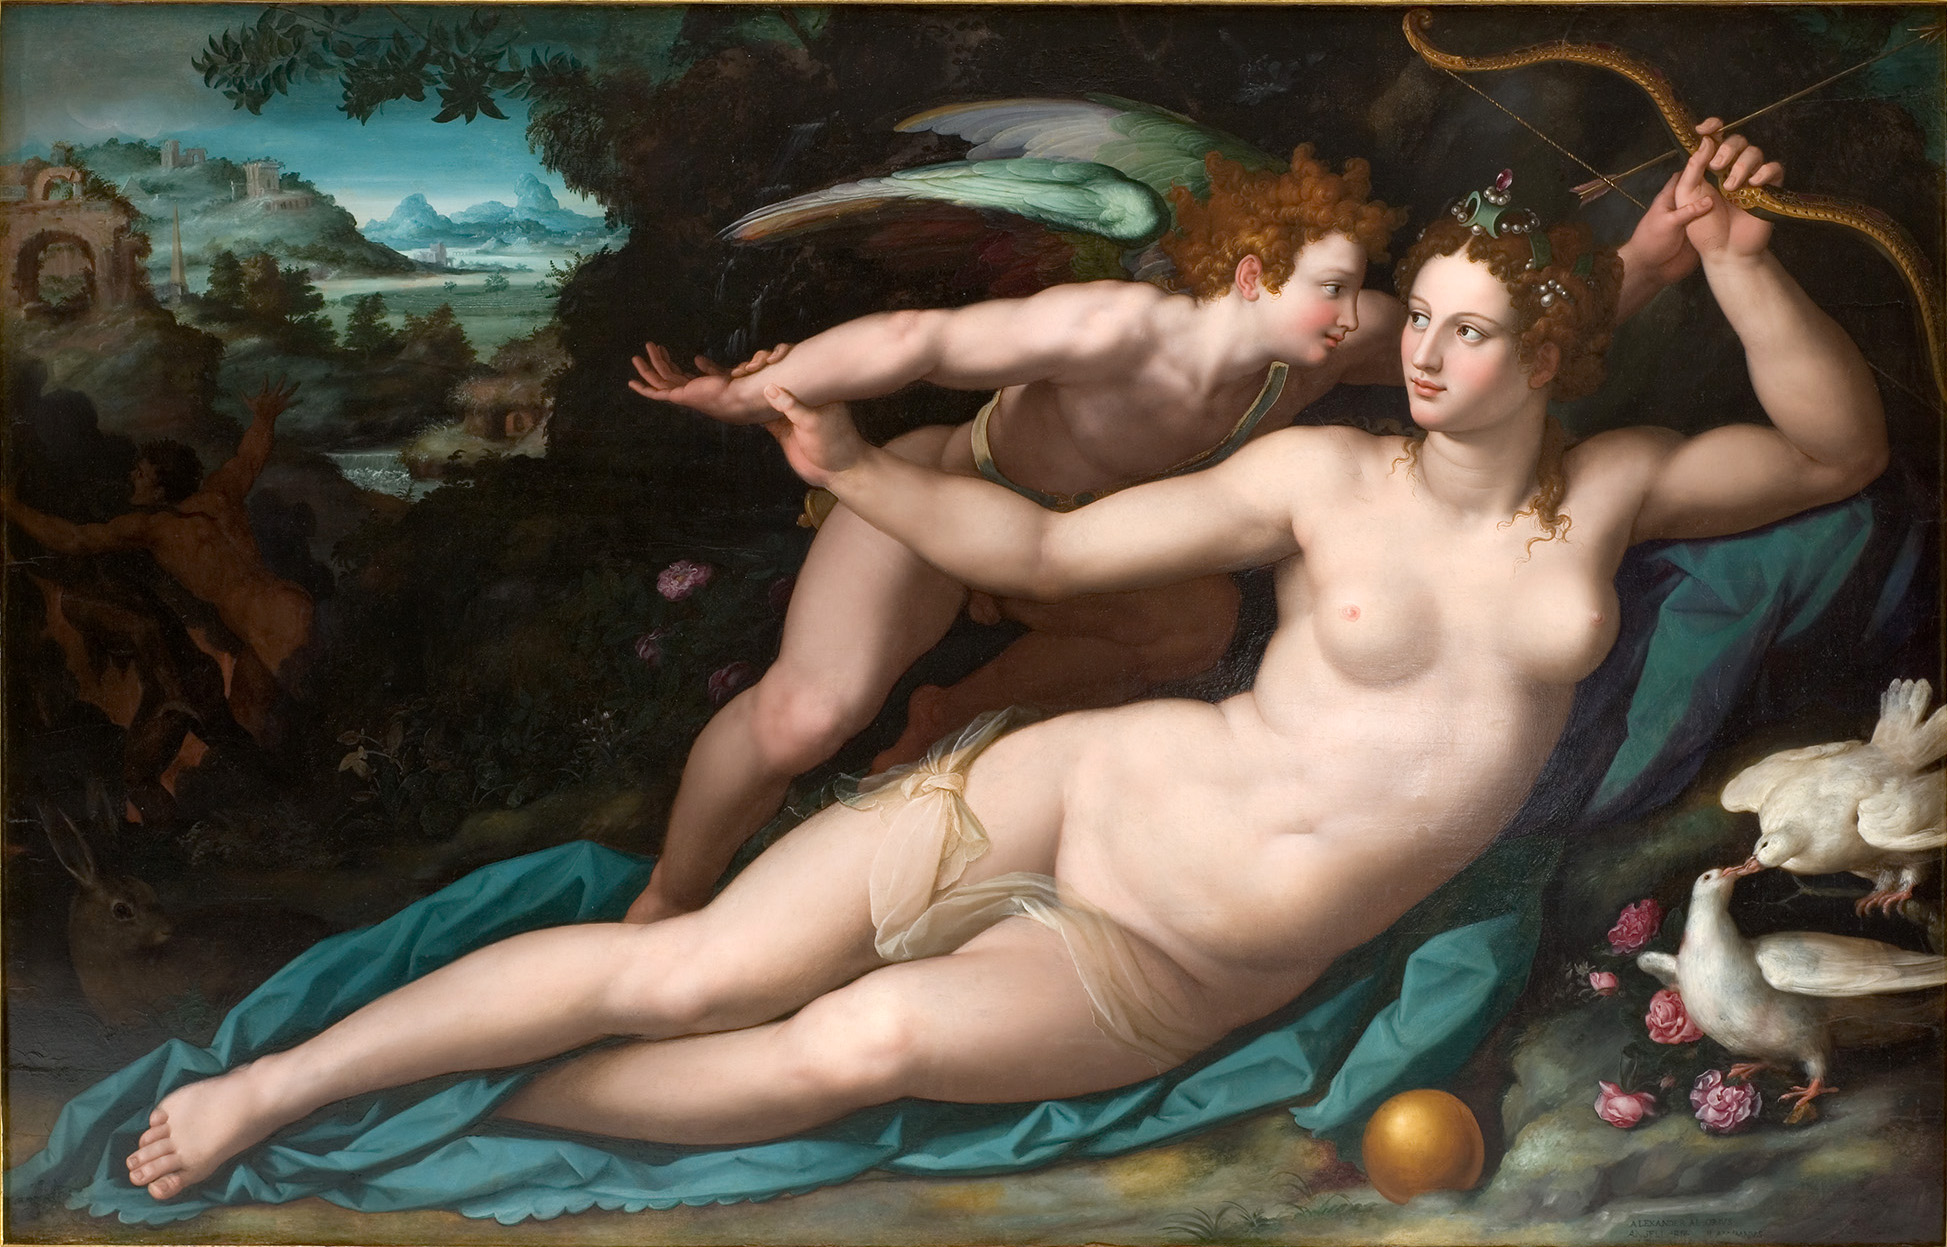 http://upload.wikimedia.org/wikipedia/commons/8/88/Allori_Venus_Cupido.jpg